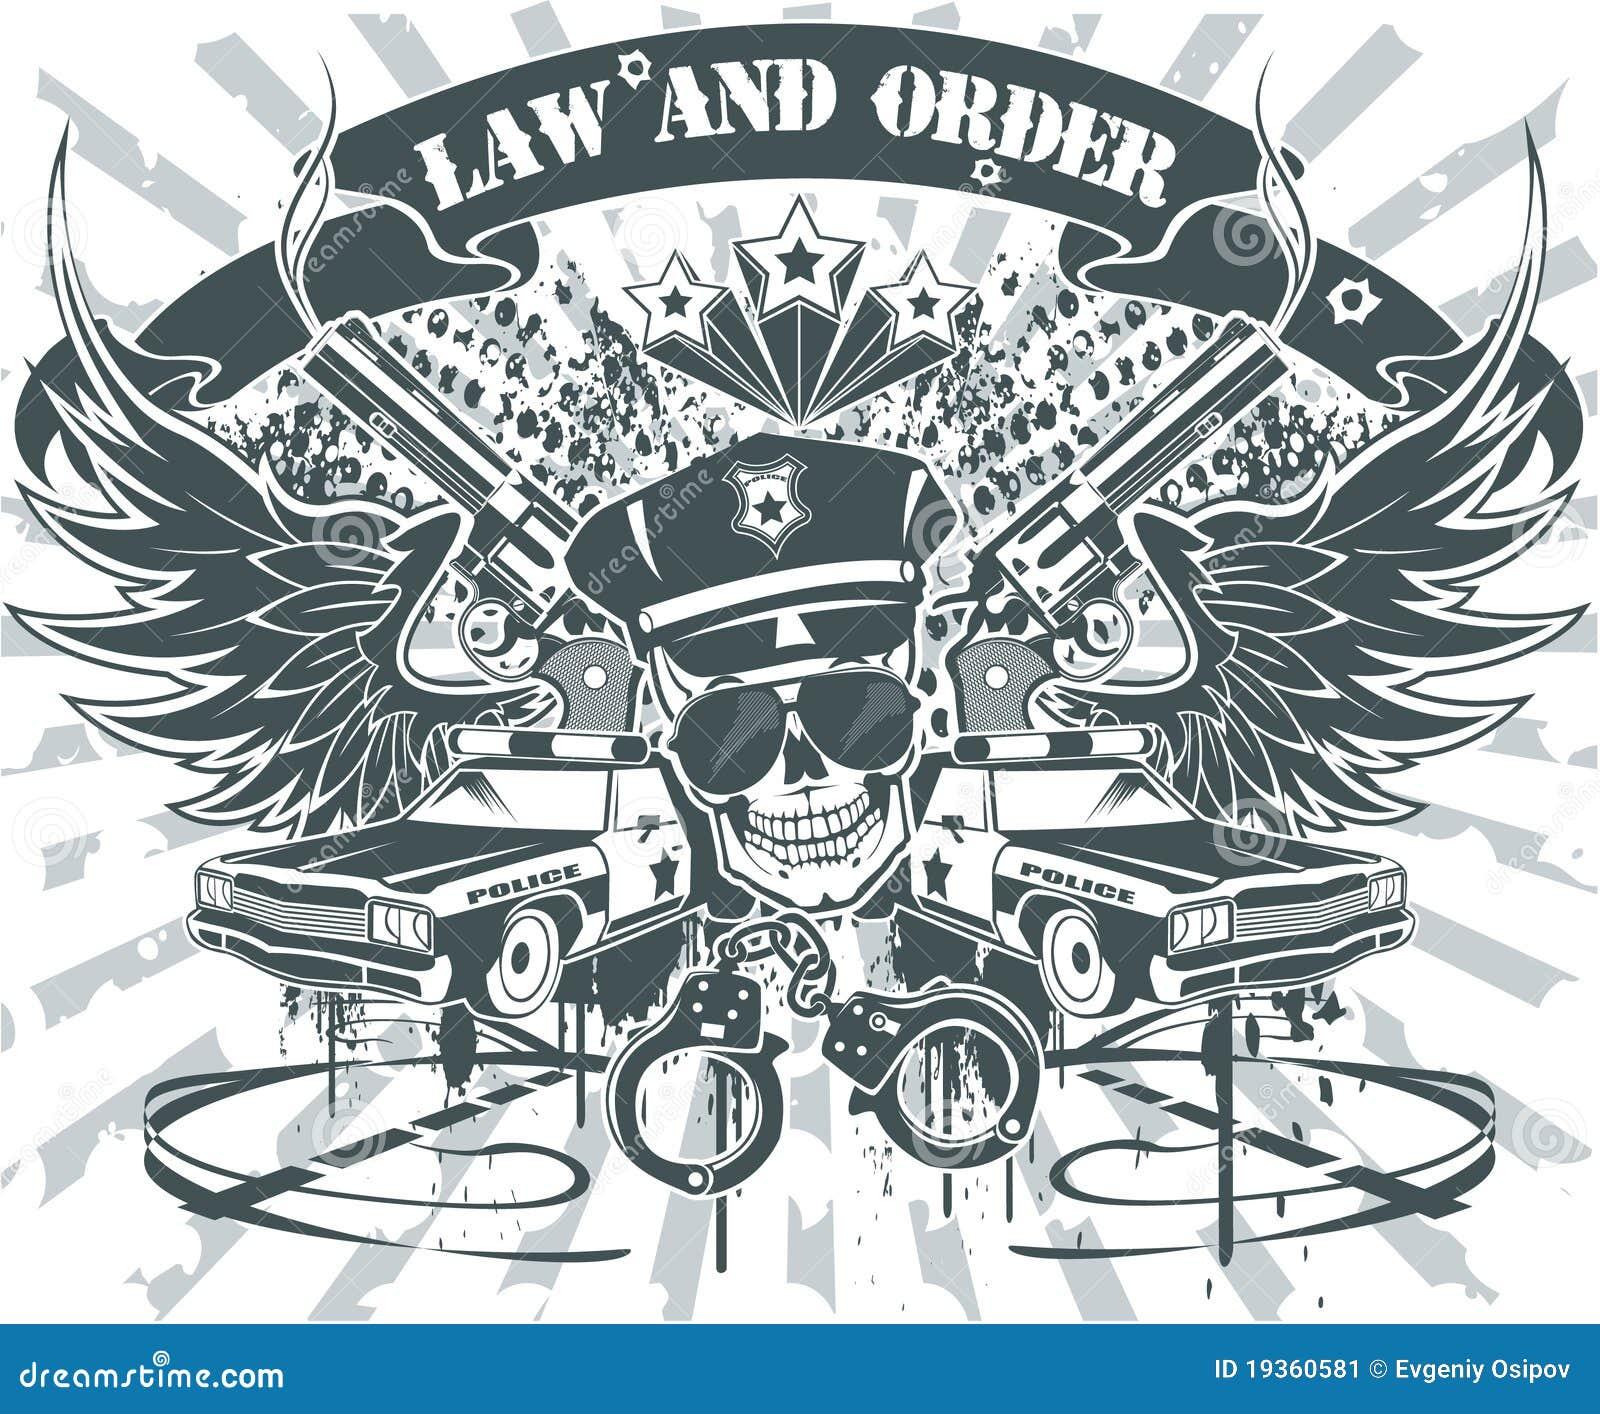 Emblema da lei e do pedido